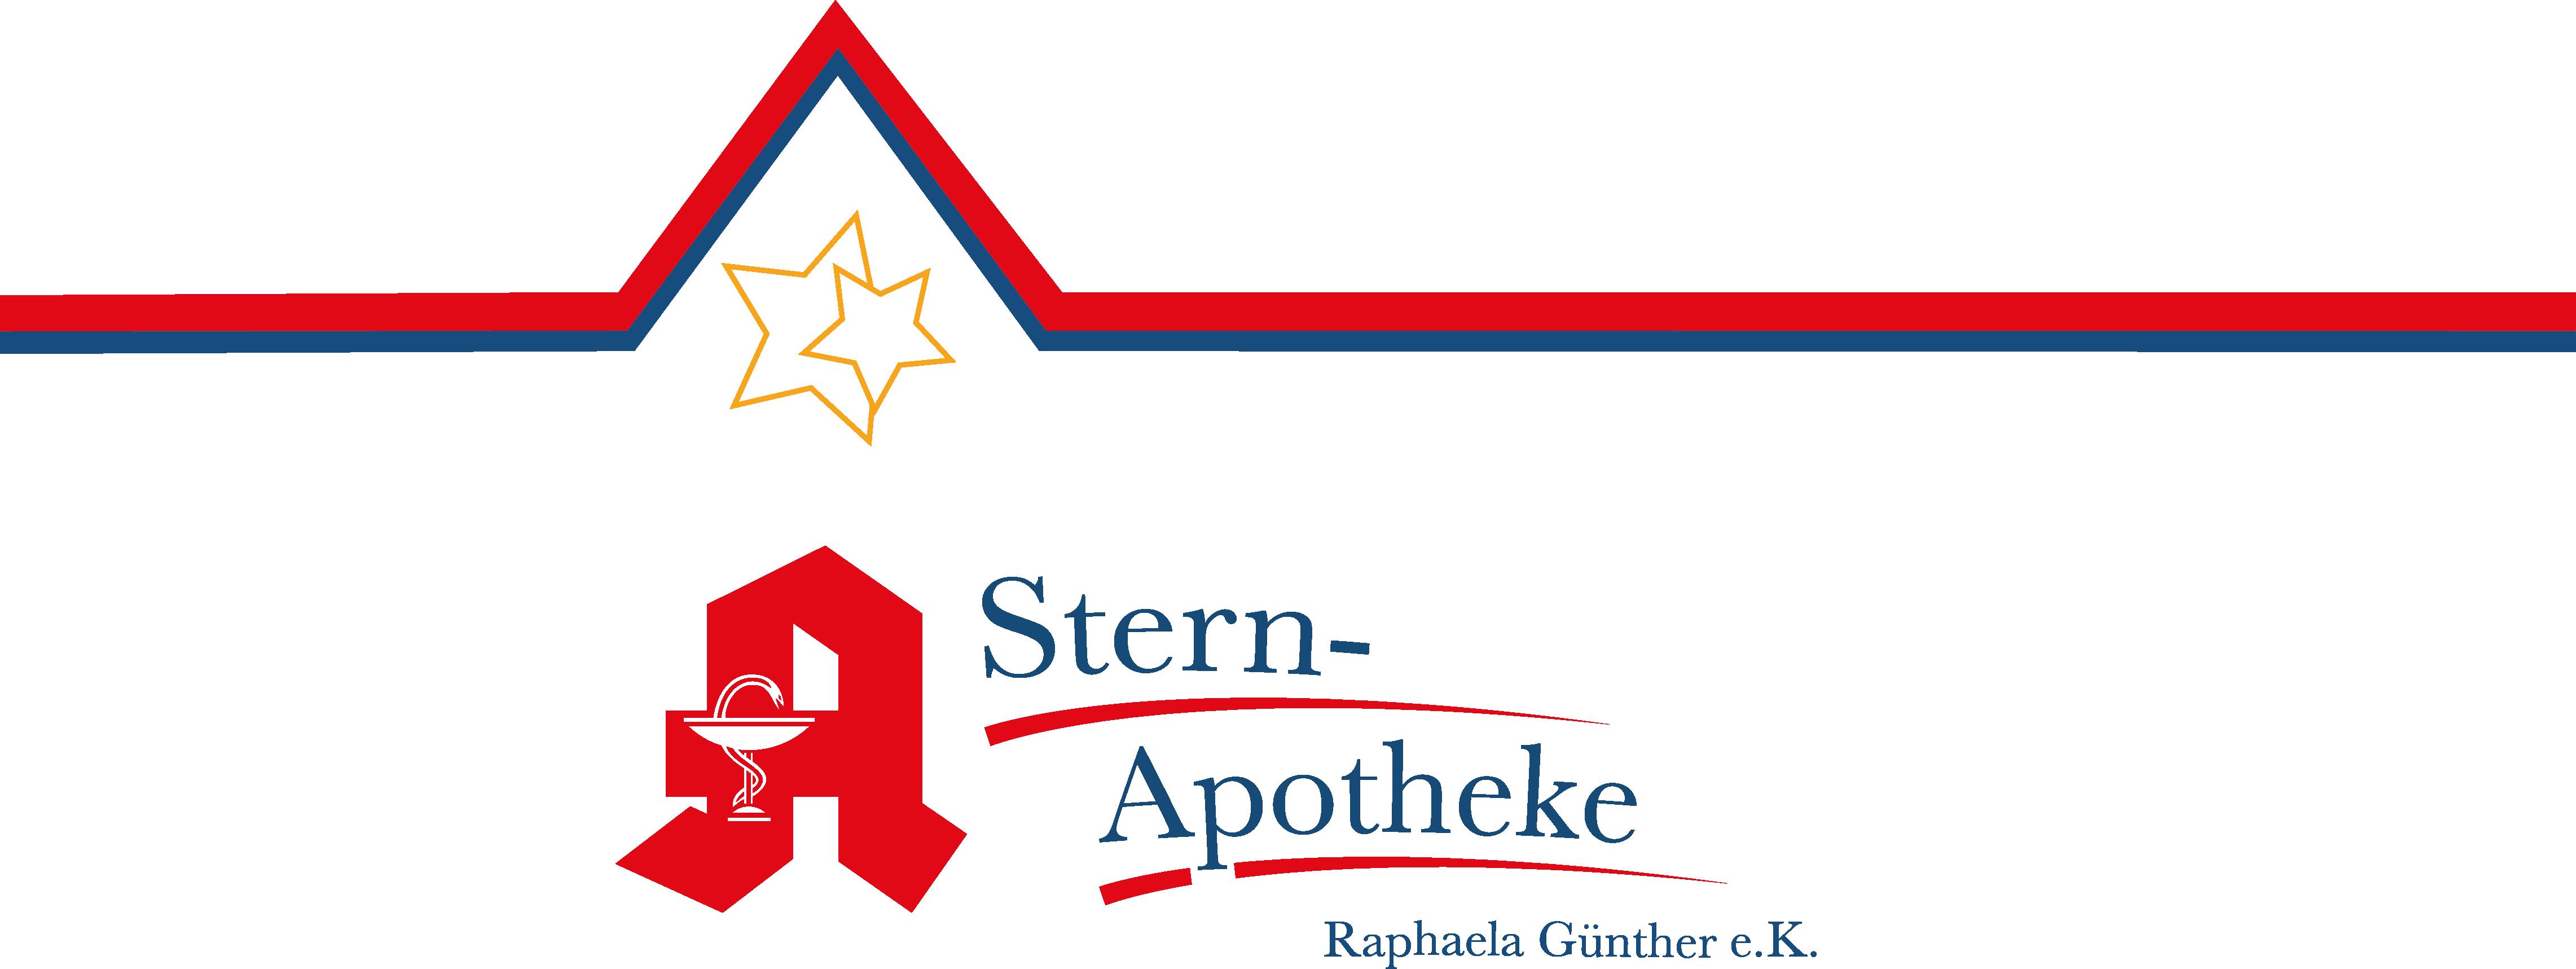 Stern-Apotheke-Rengsdorf